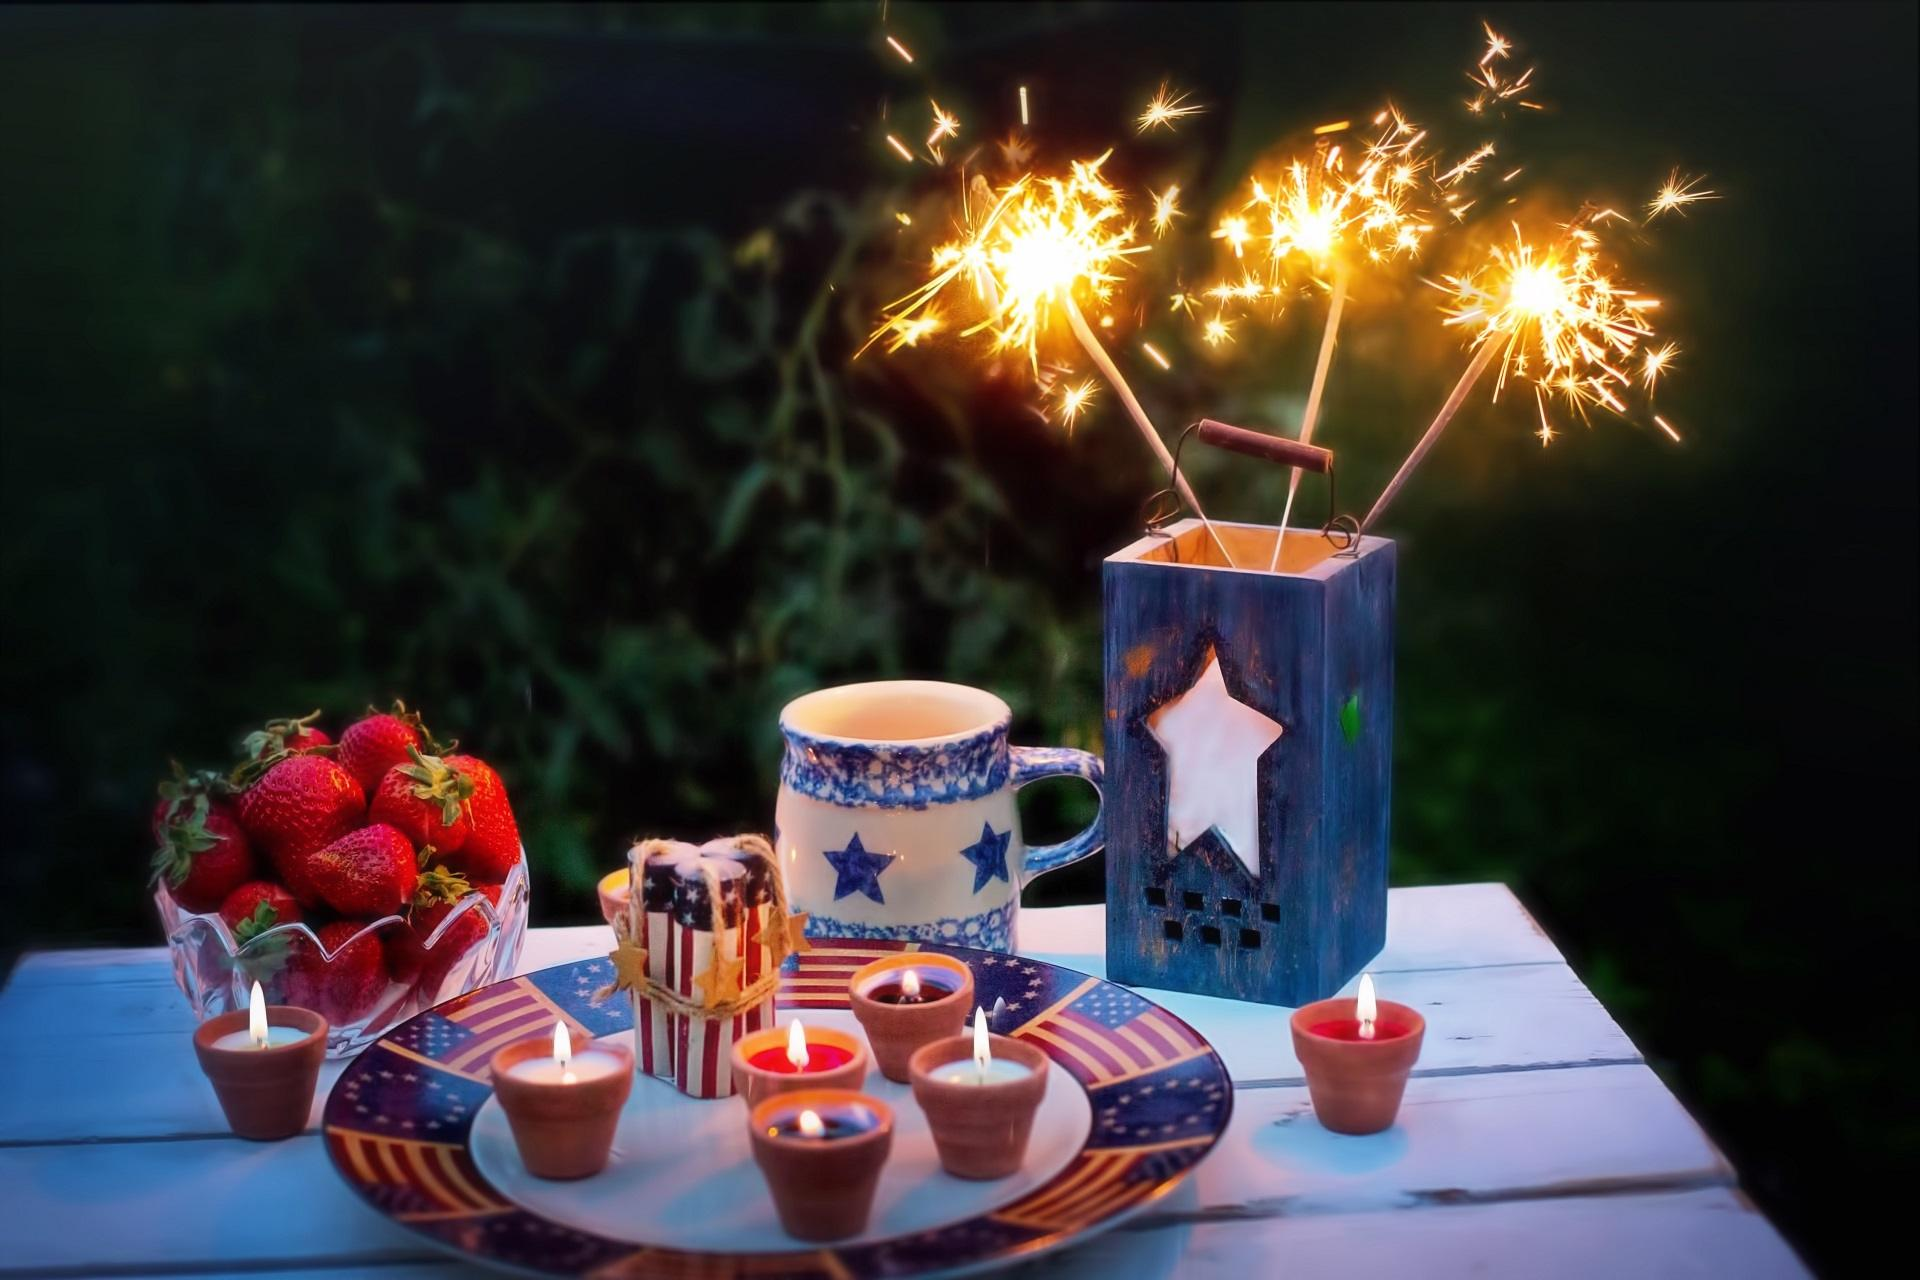 5 Swoon-Worthy Patriotic Room Ideas: Wishlist for Summer Holidays